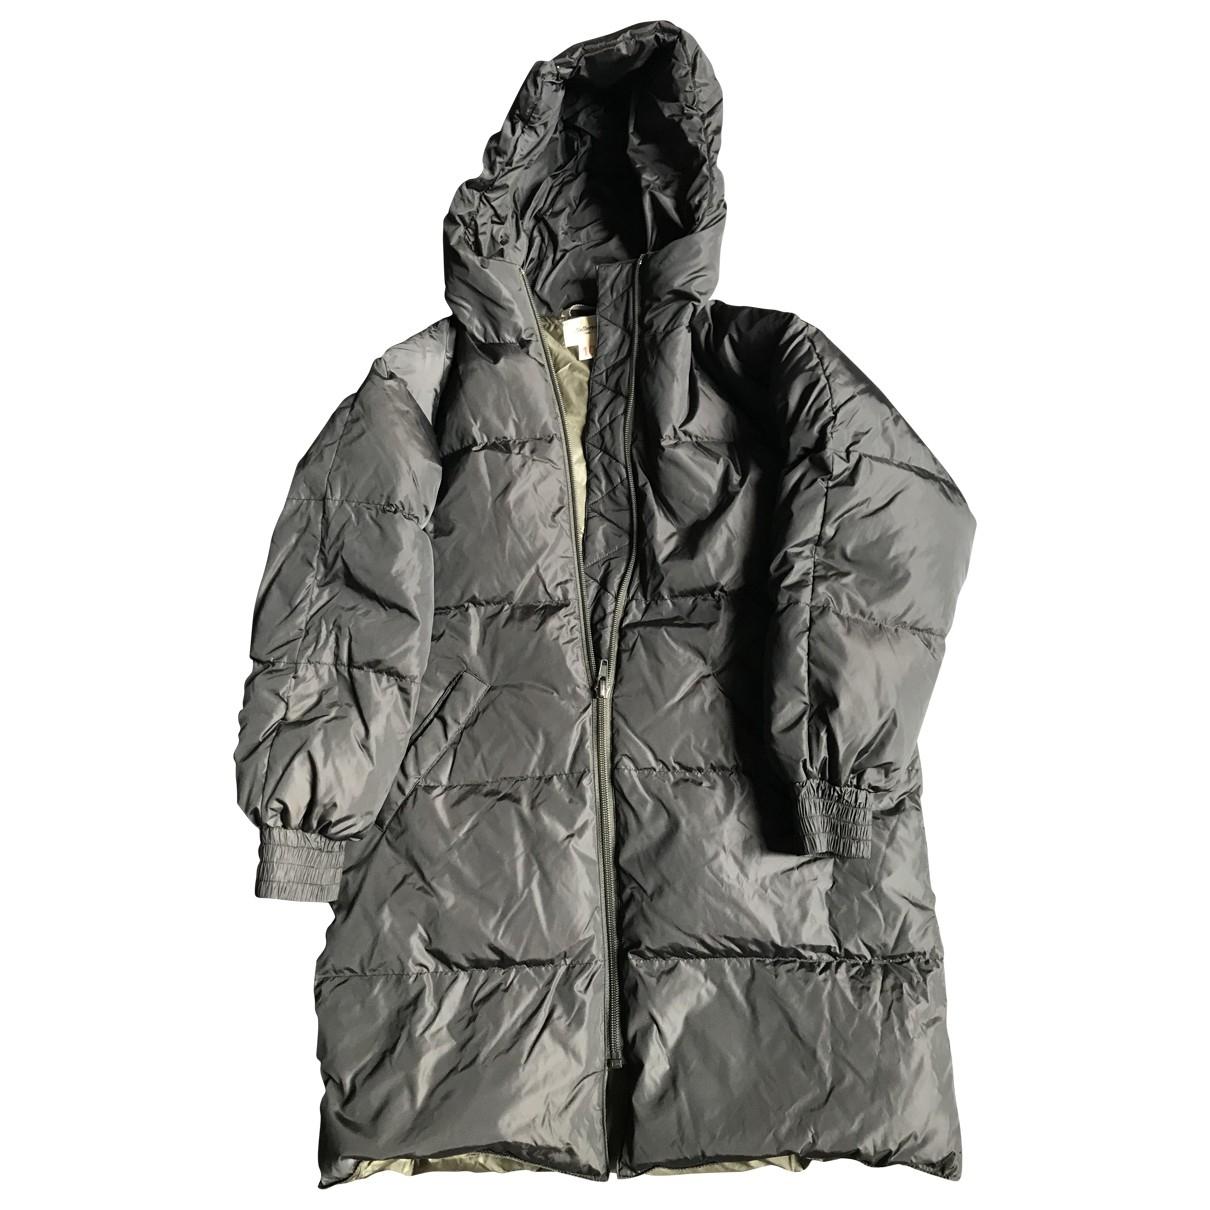 Bellerose \N Anthracite jacket & coat for Kids 10 years - up to 142cm FR